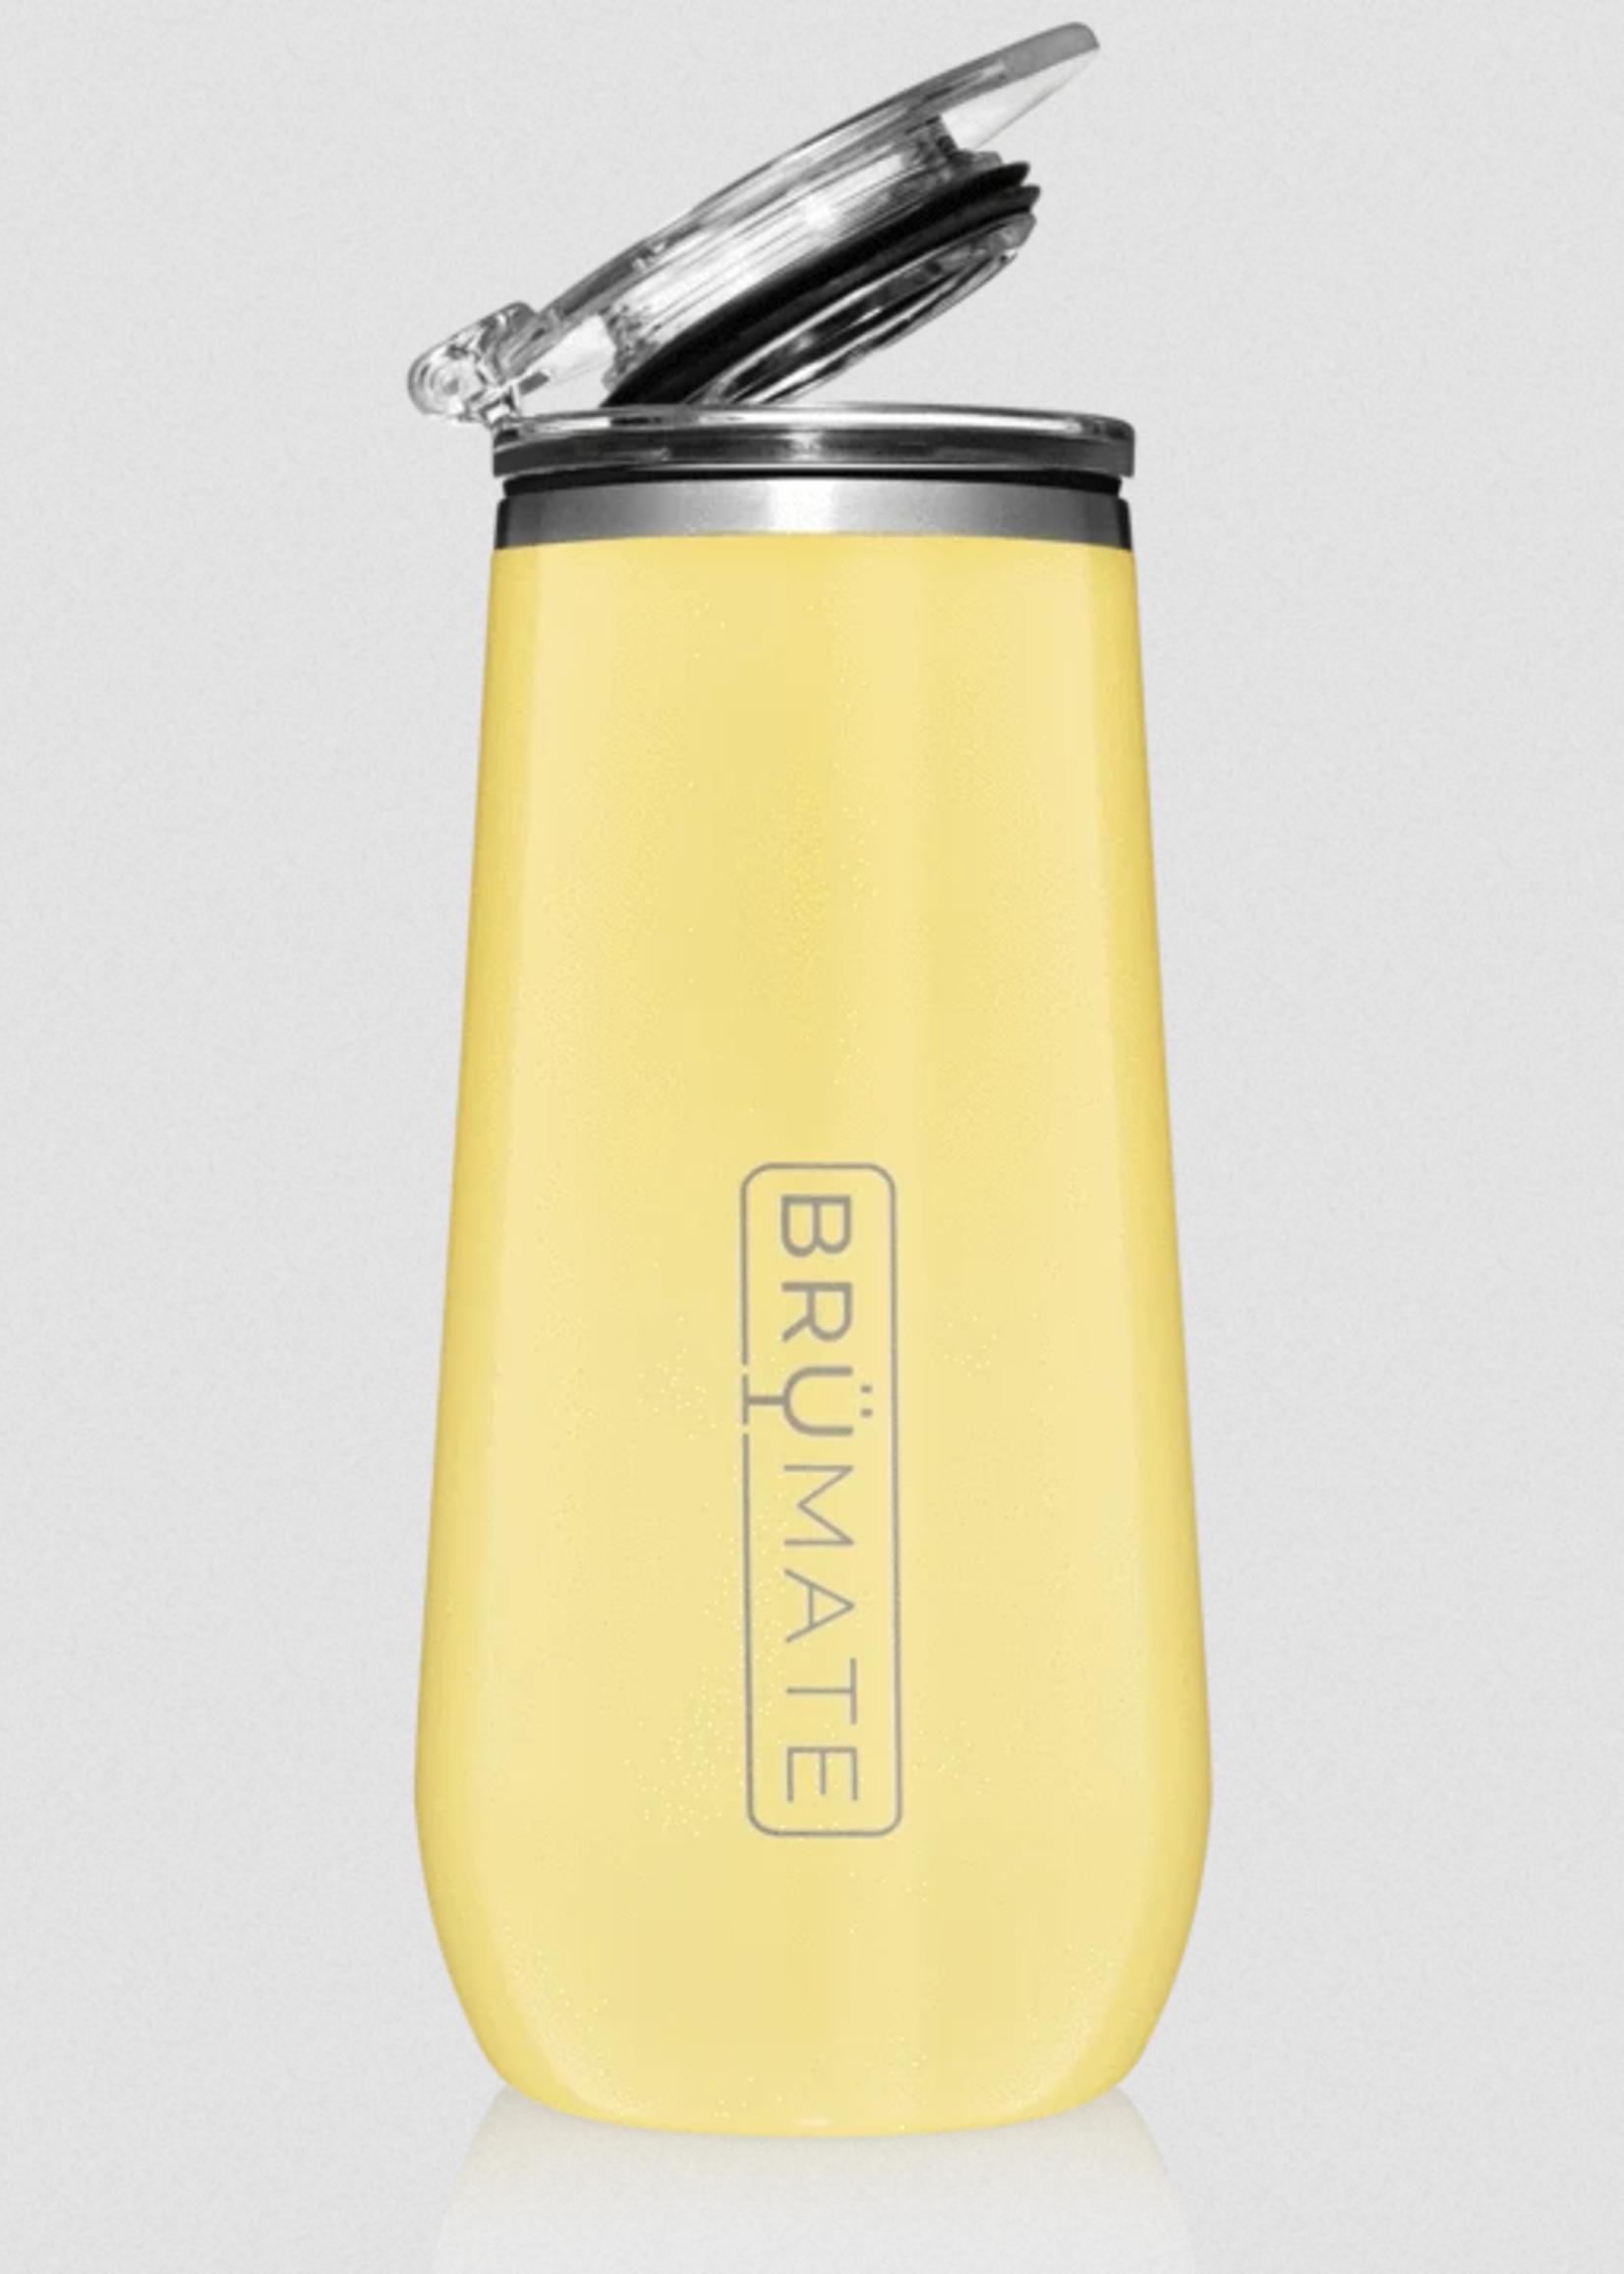 Brumate 12oz Champagne Flute